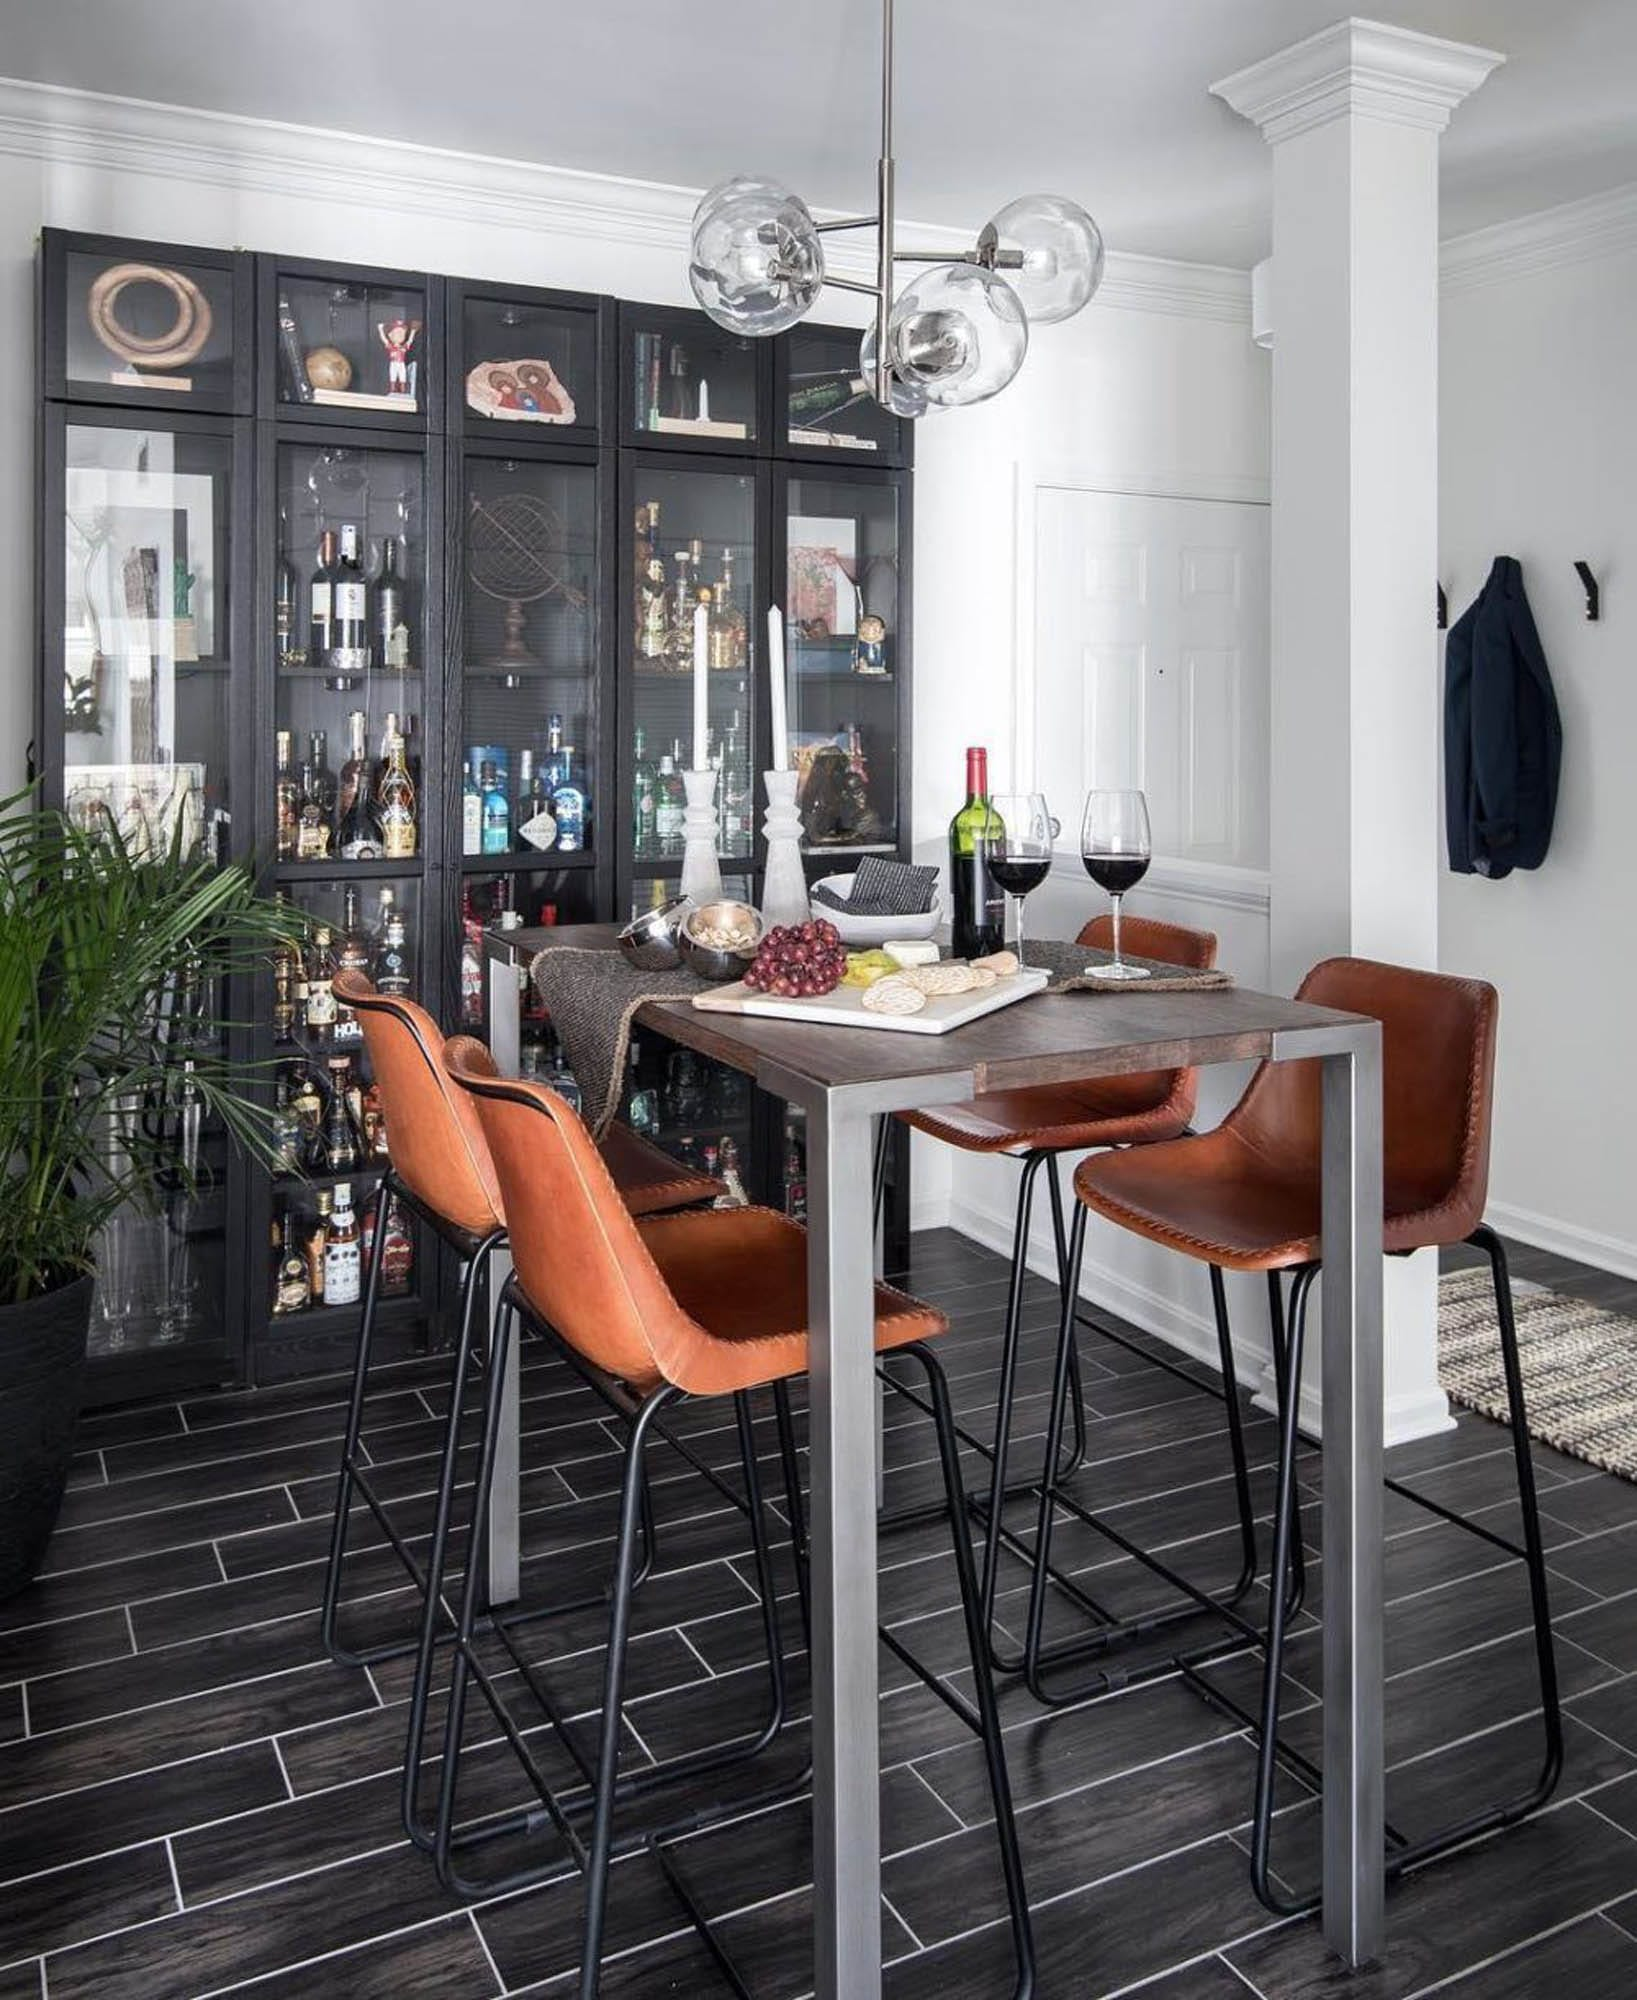 Tiled home bar and table